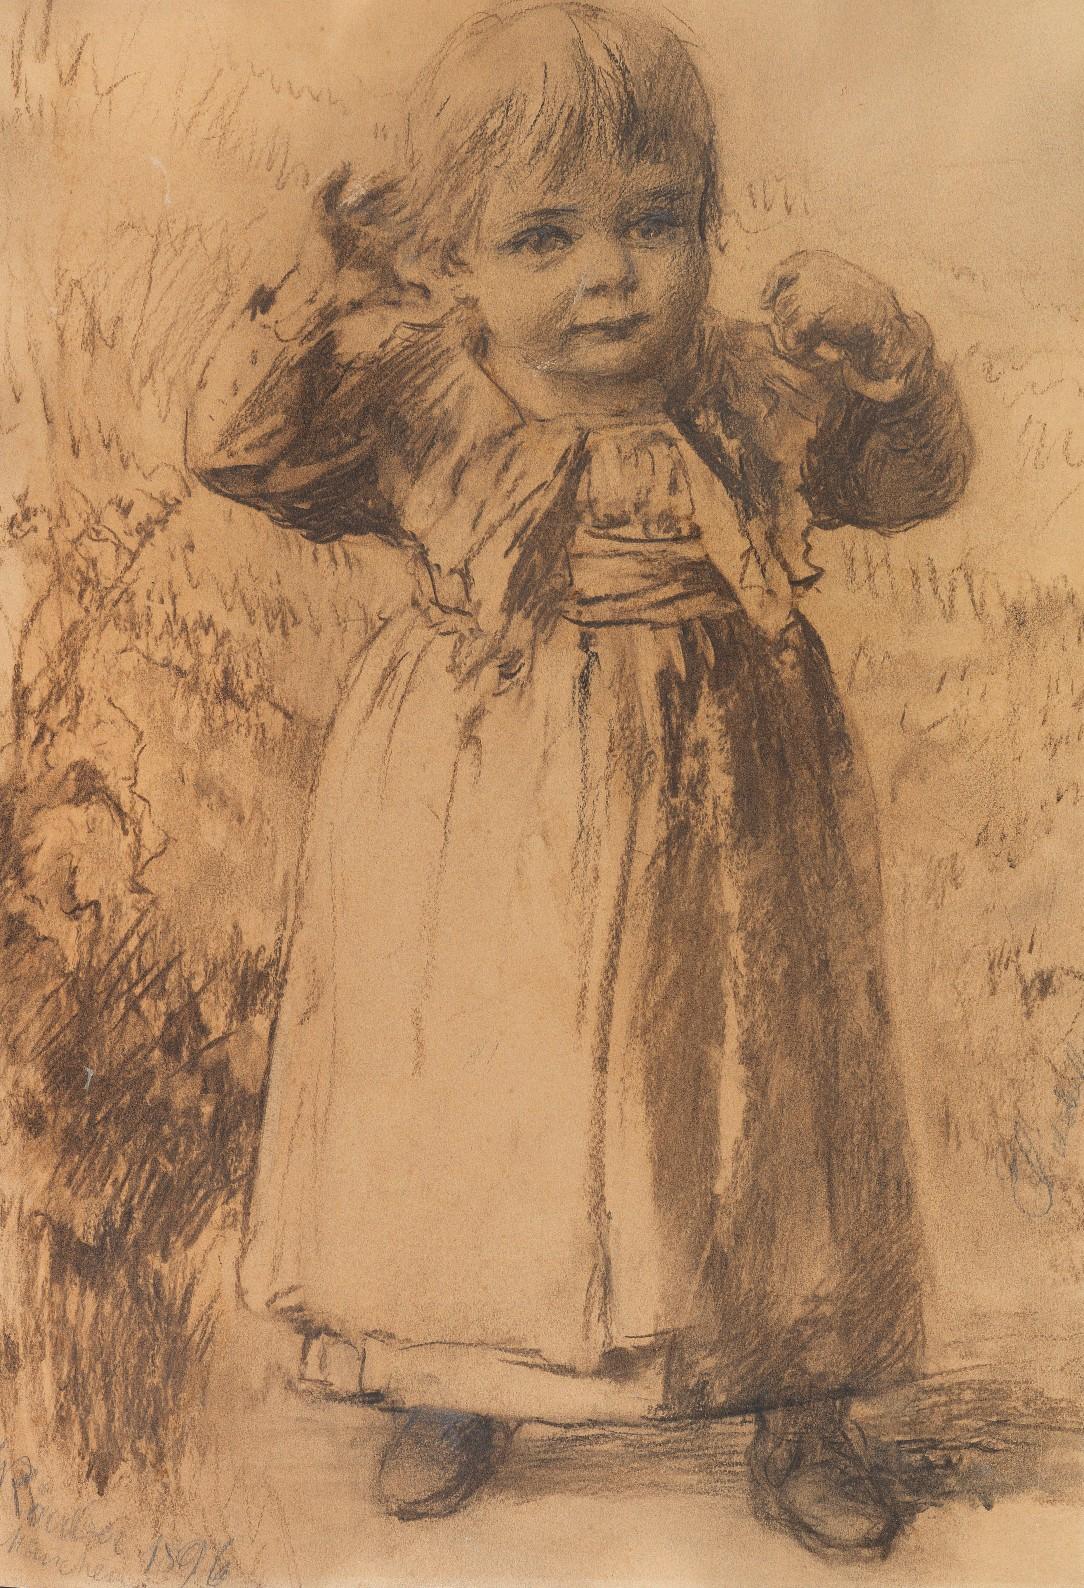 Wilhelm_Räuber_Kinderporträt_(Adoptivtochter)_I